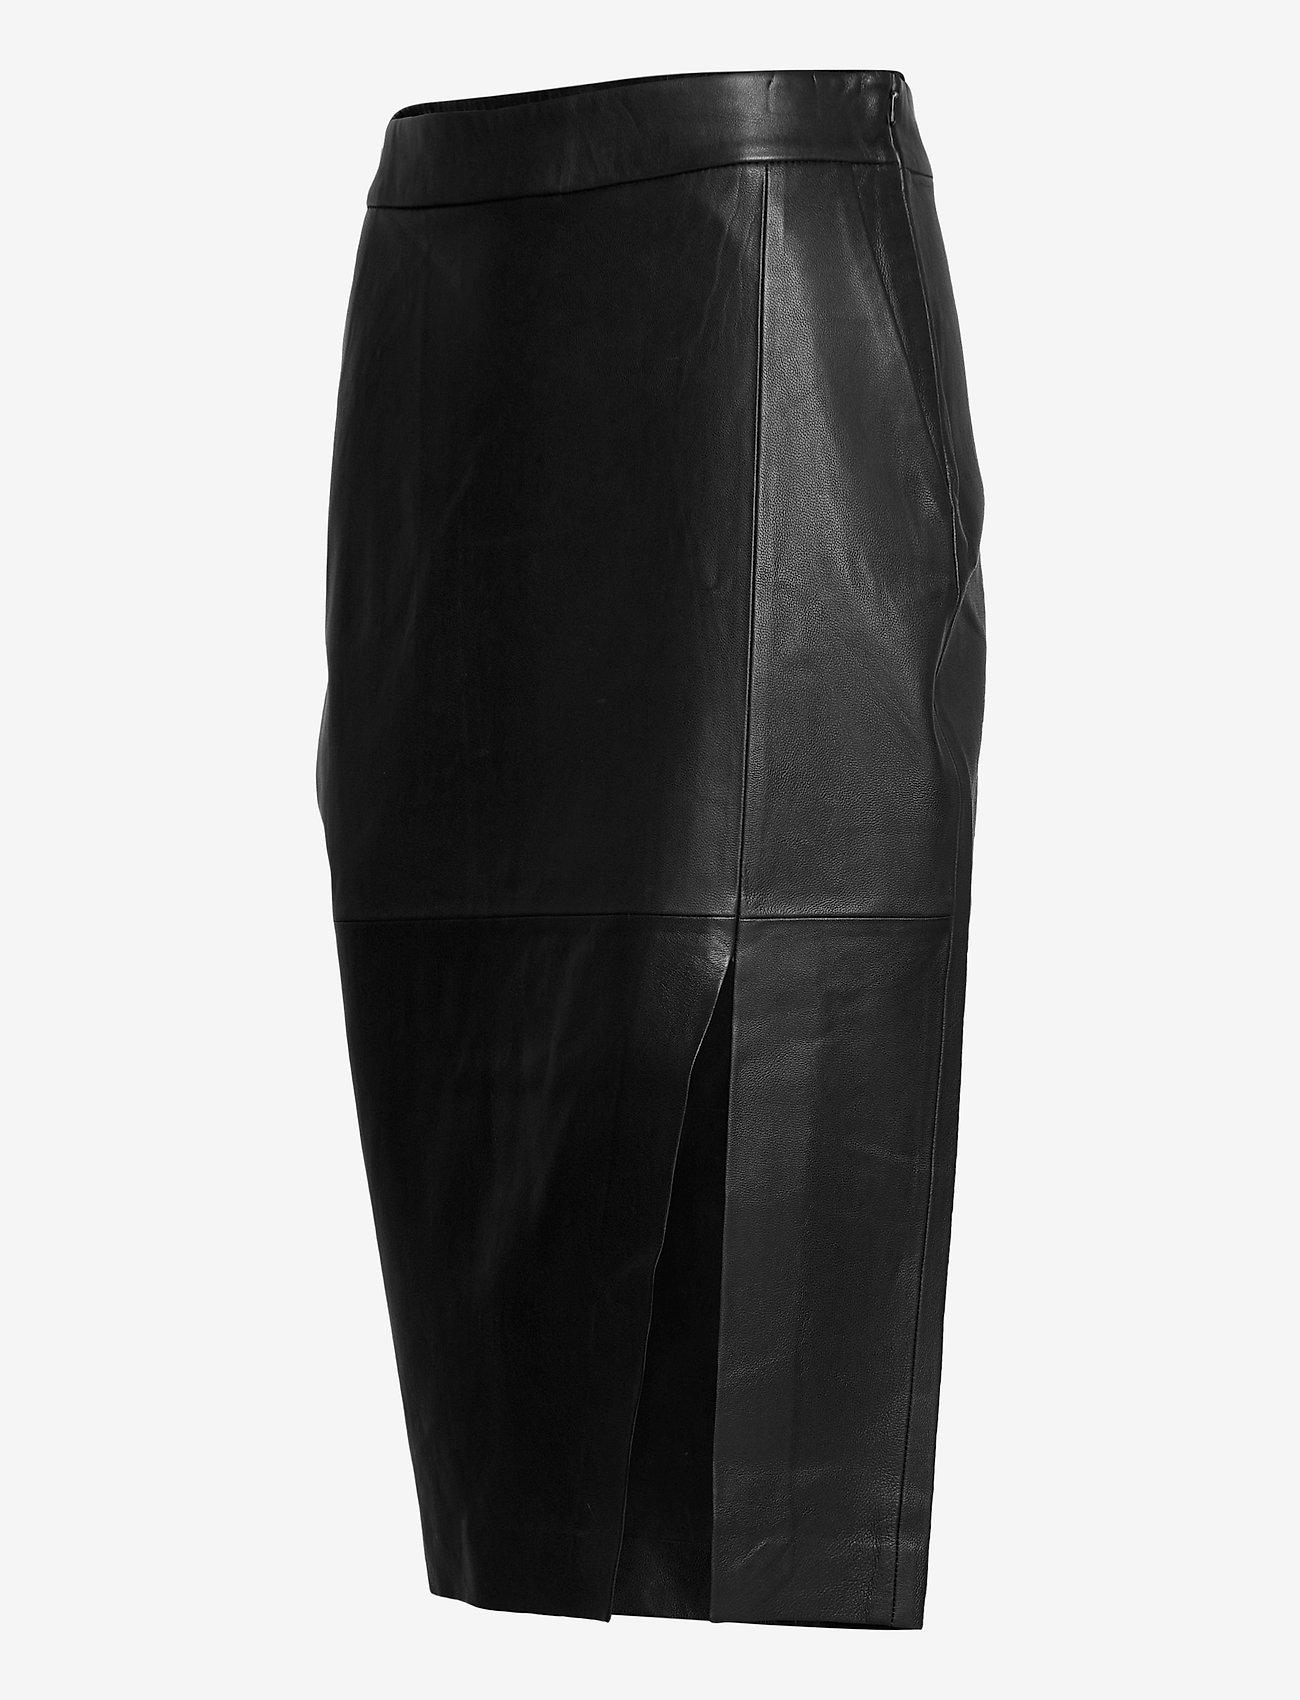 Thousand skirt day-1